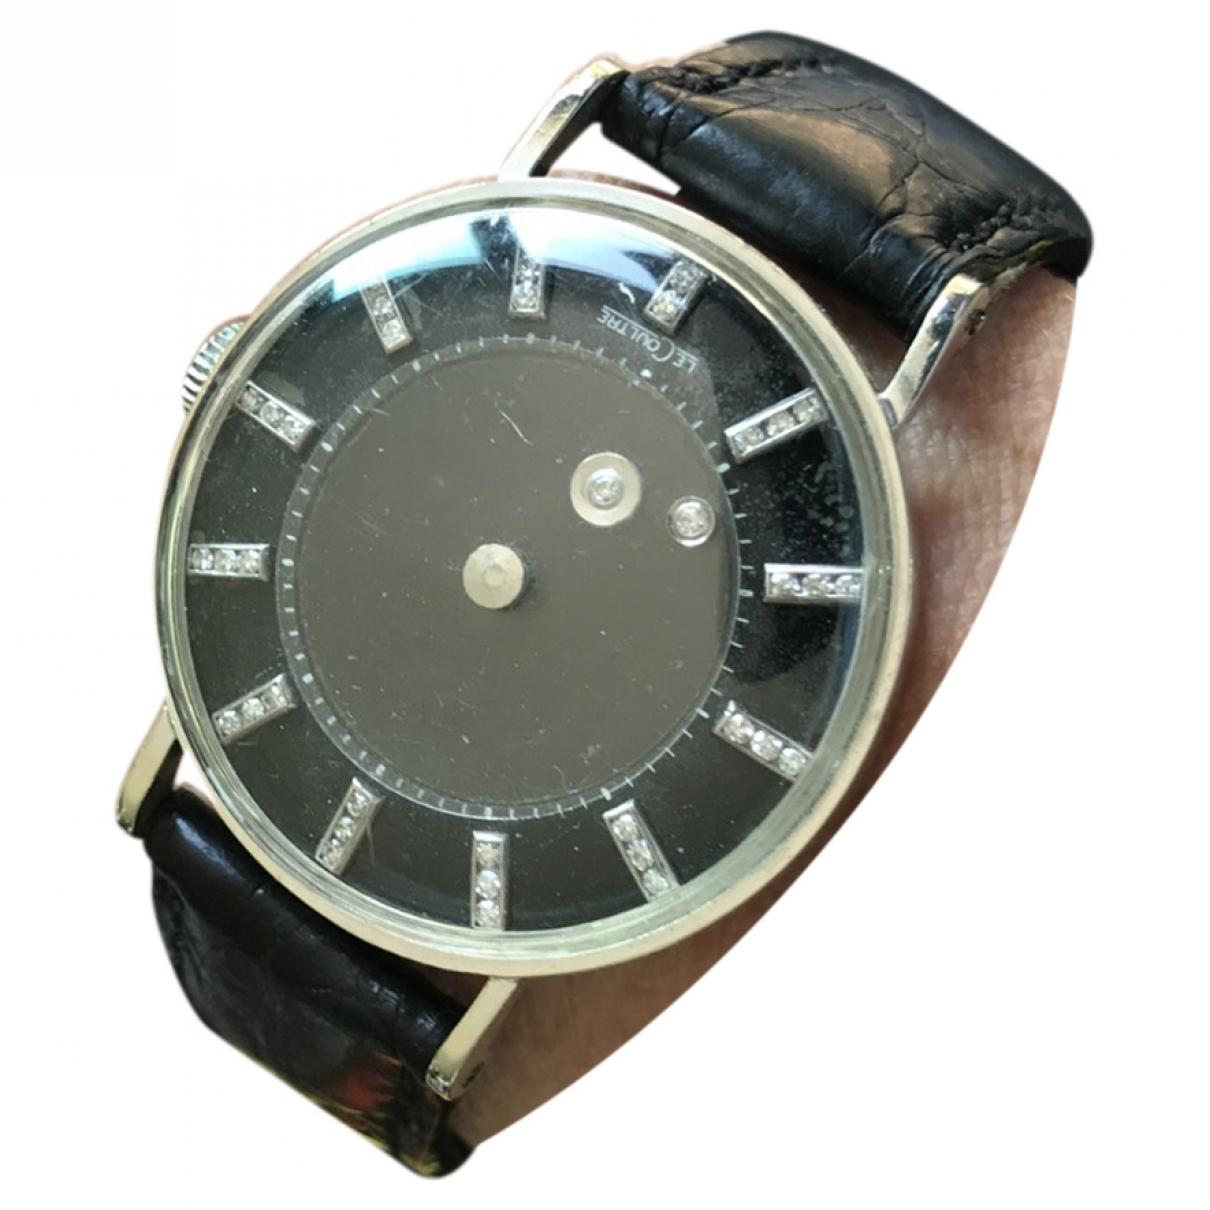 Relojes Vintage de Oro blanco Jaeger-lecoultre